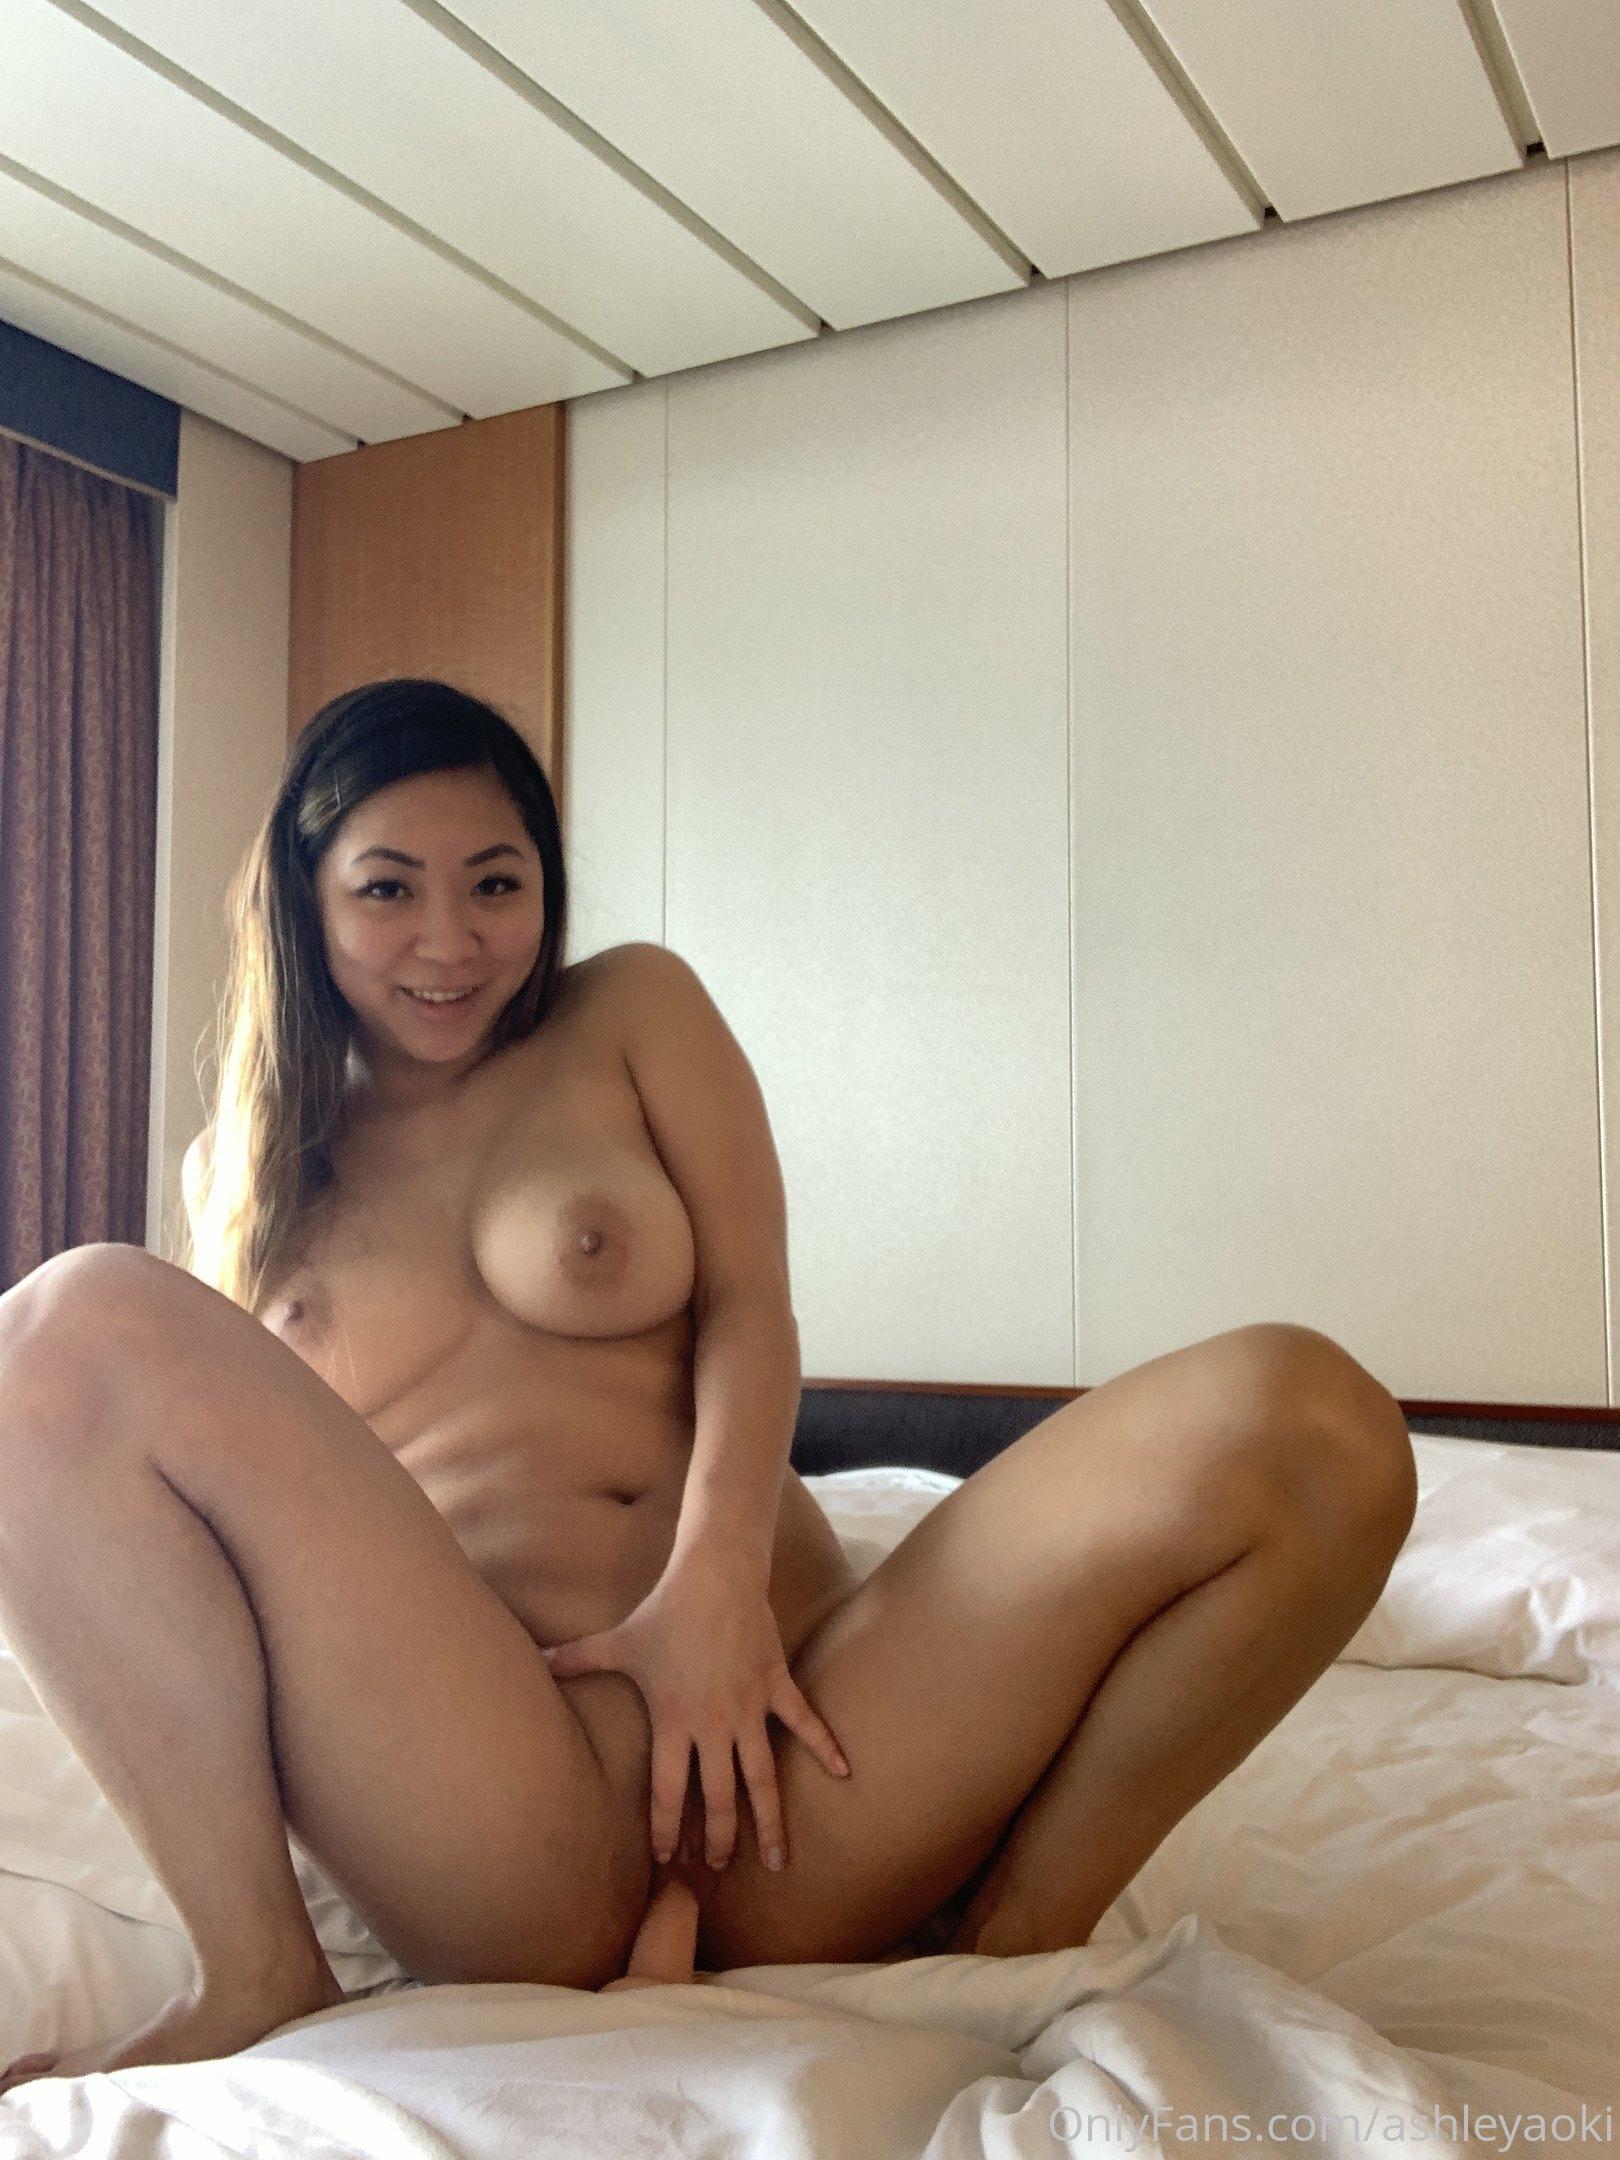 Ashley Aoki, Ashleyaoki, Onlyfans Leaks 0188